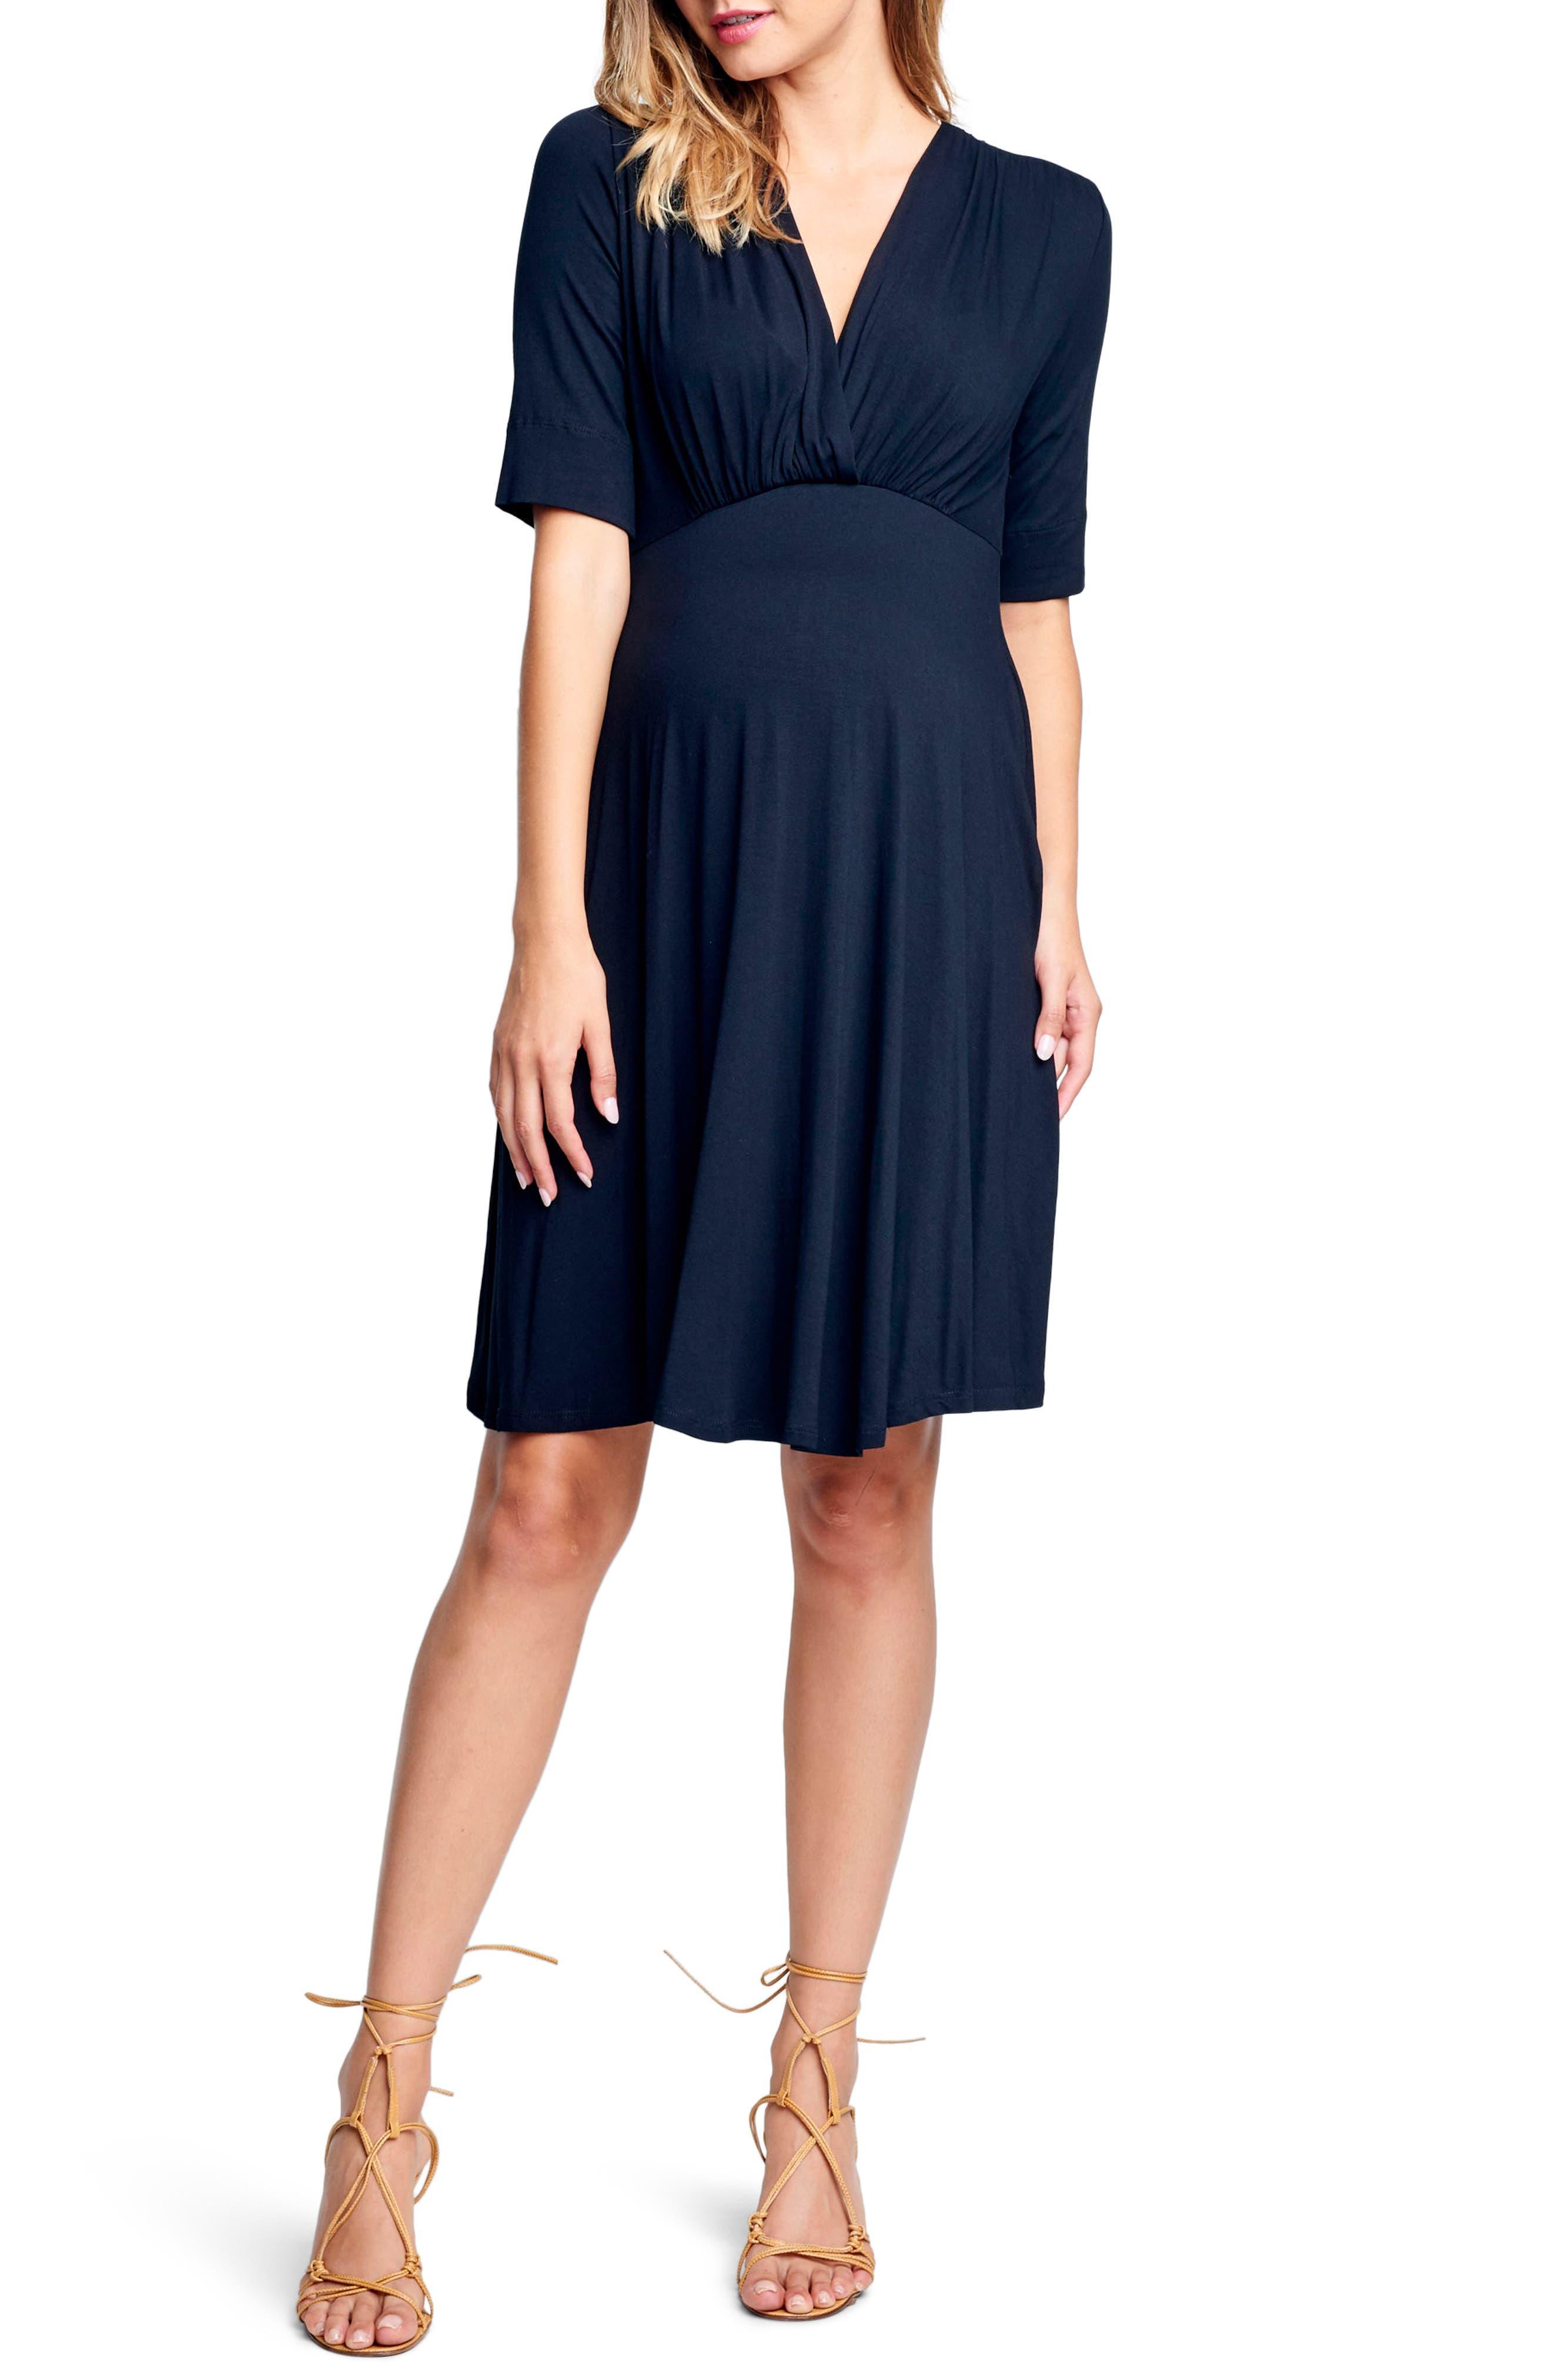 Maternal America Empire Waist Stretch Maternity Dress